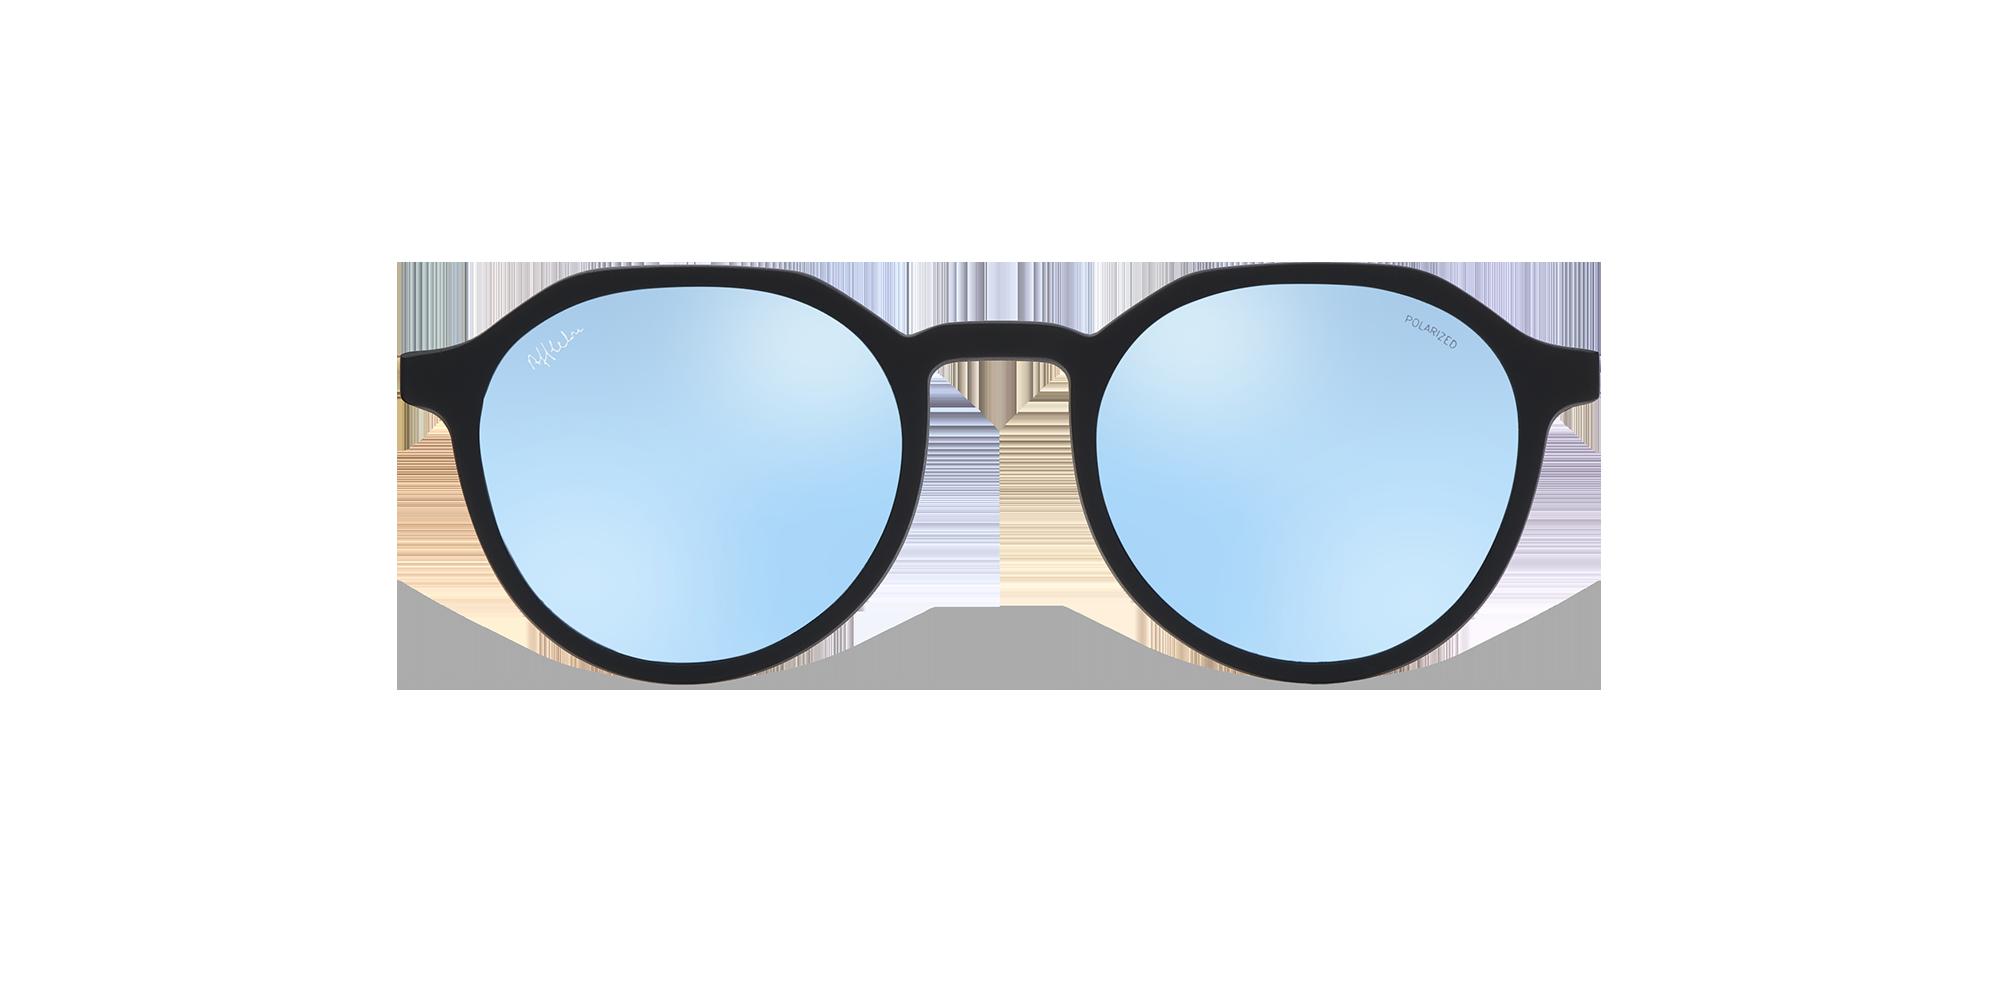 afflelou/france/products/smart_clip/clips_glasses/07630036428948_face.png